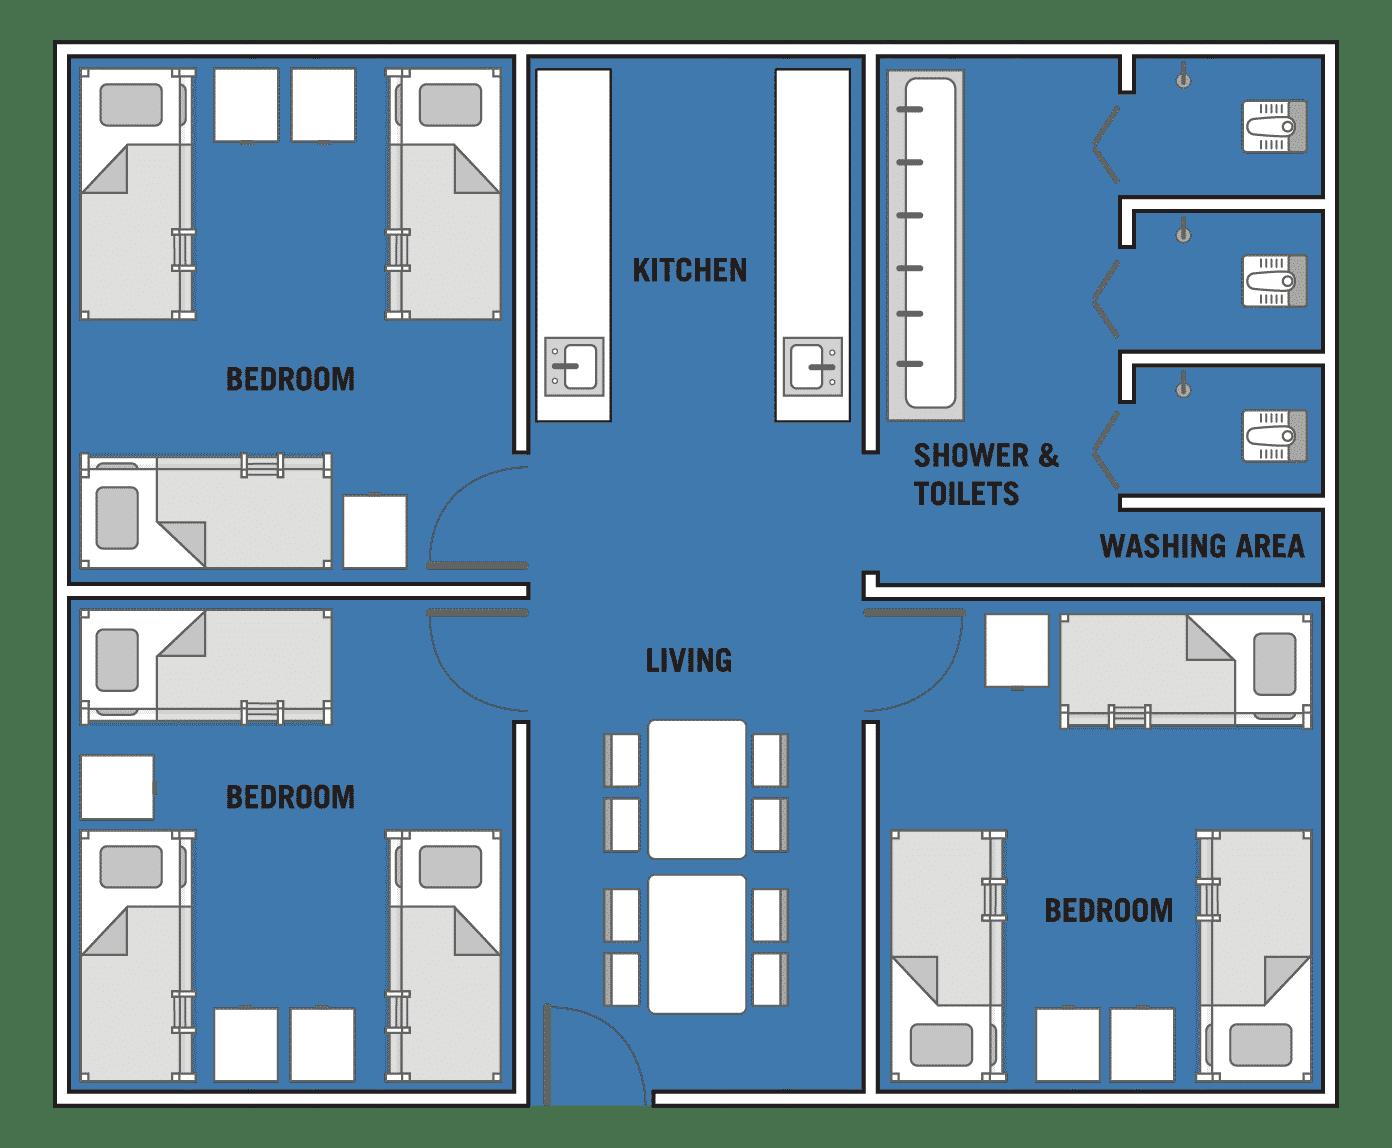 Floorplan of a typical apartment at Westlite Bukit Minyak